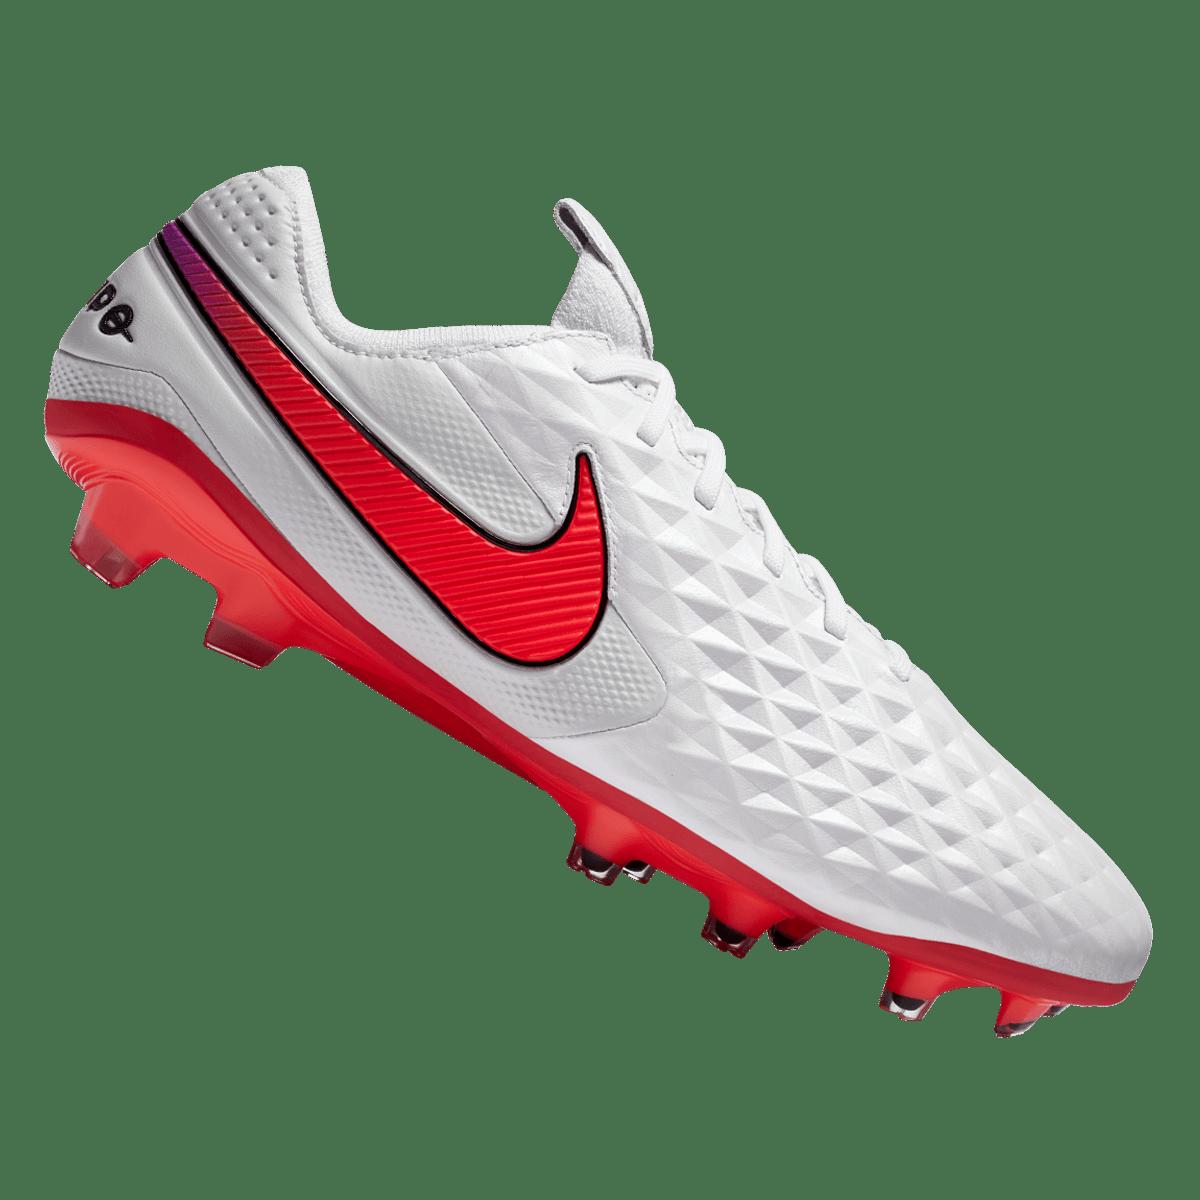 Chaussure de football Nike Tiempo Legend VIII Elite FG blanc/orange